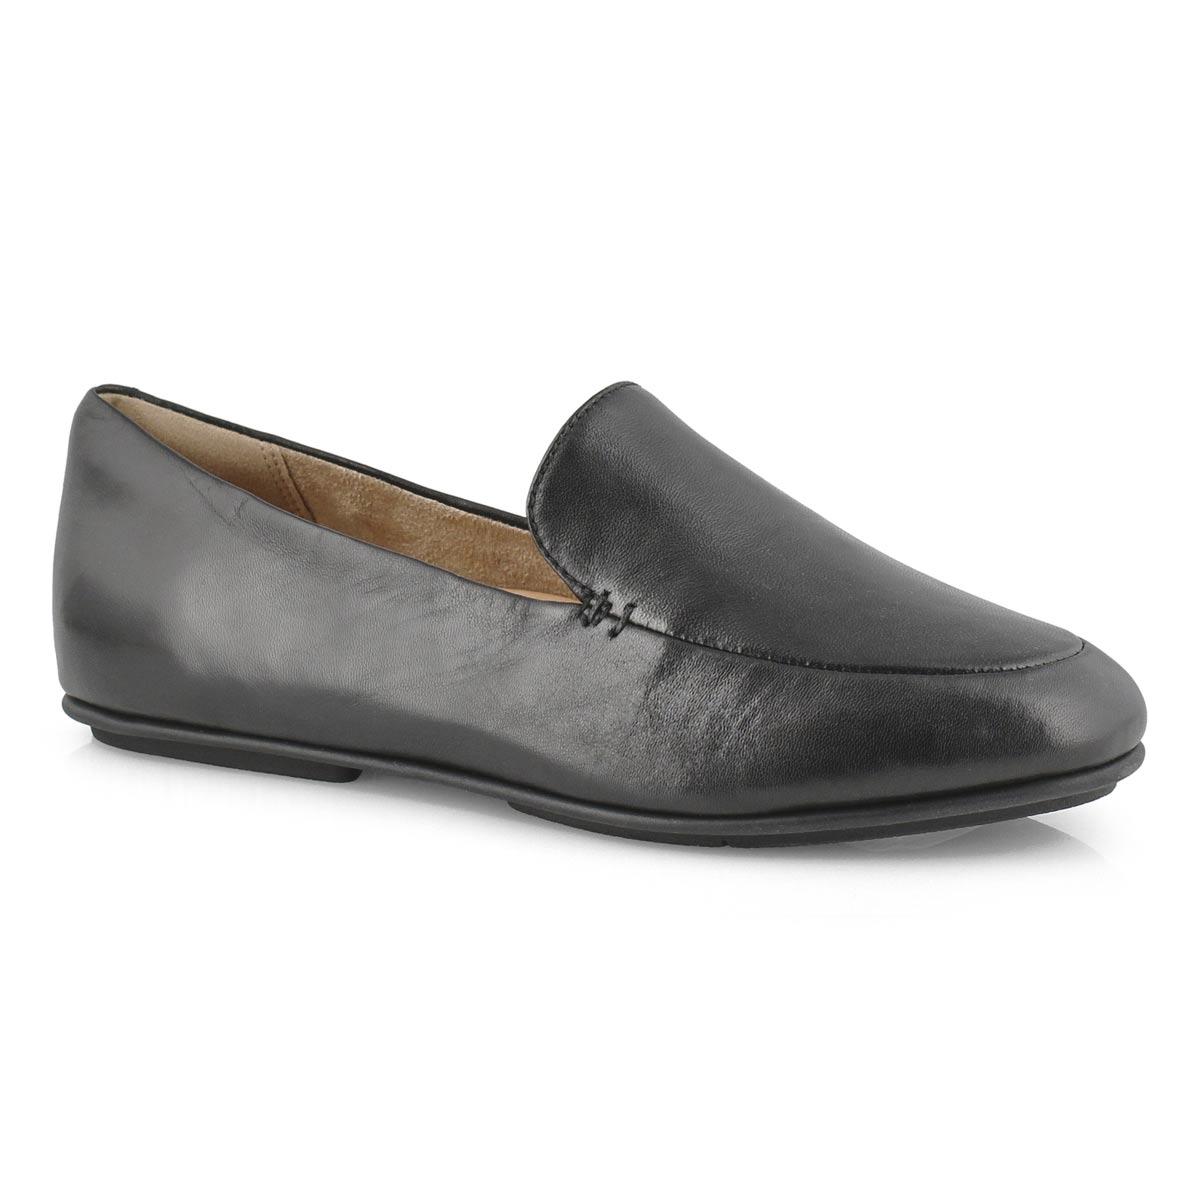 Lds Lena Loafer black casual slip on